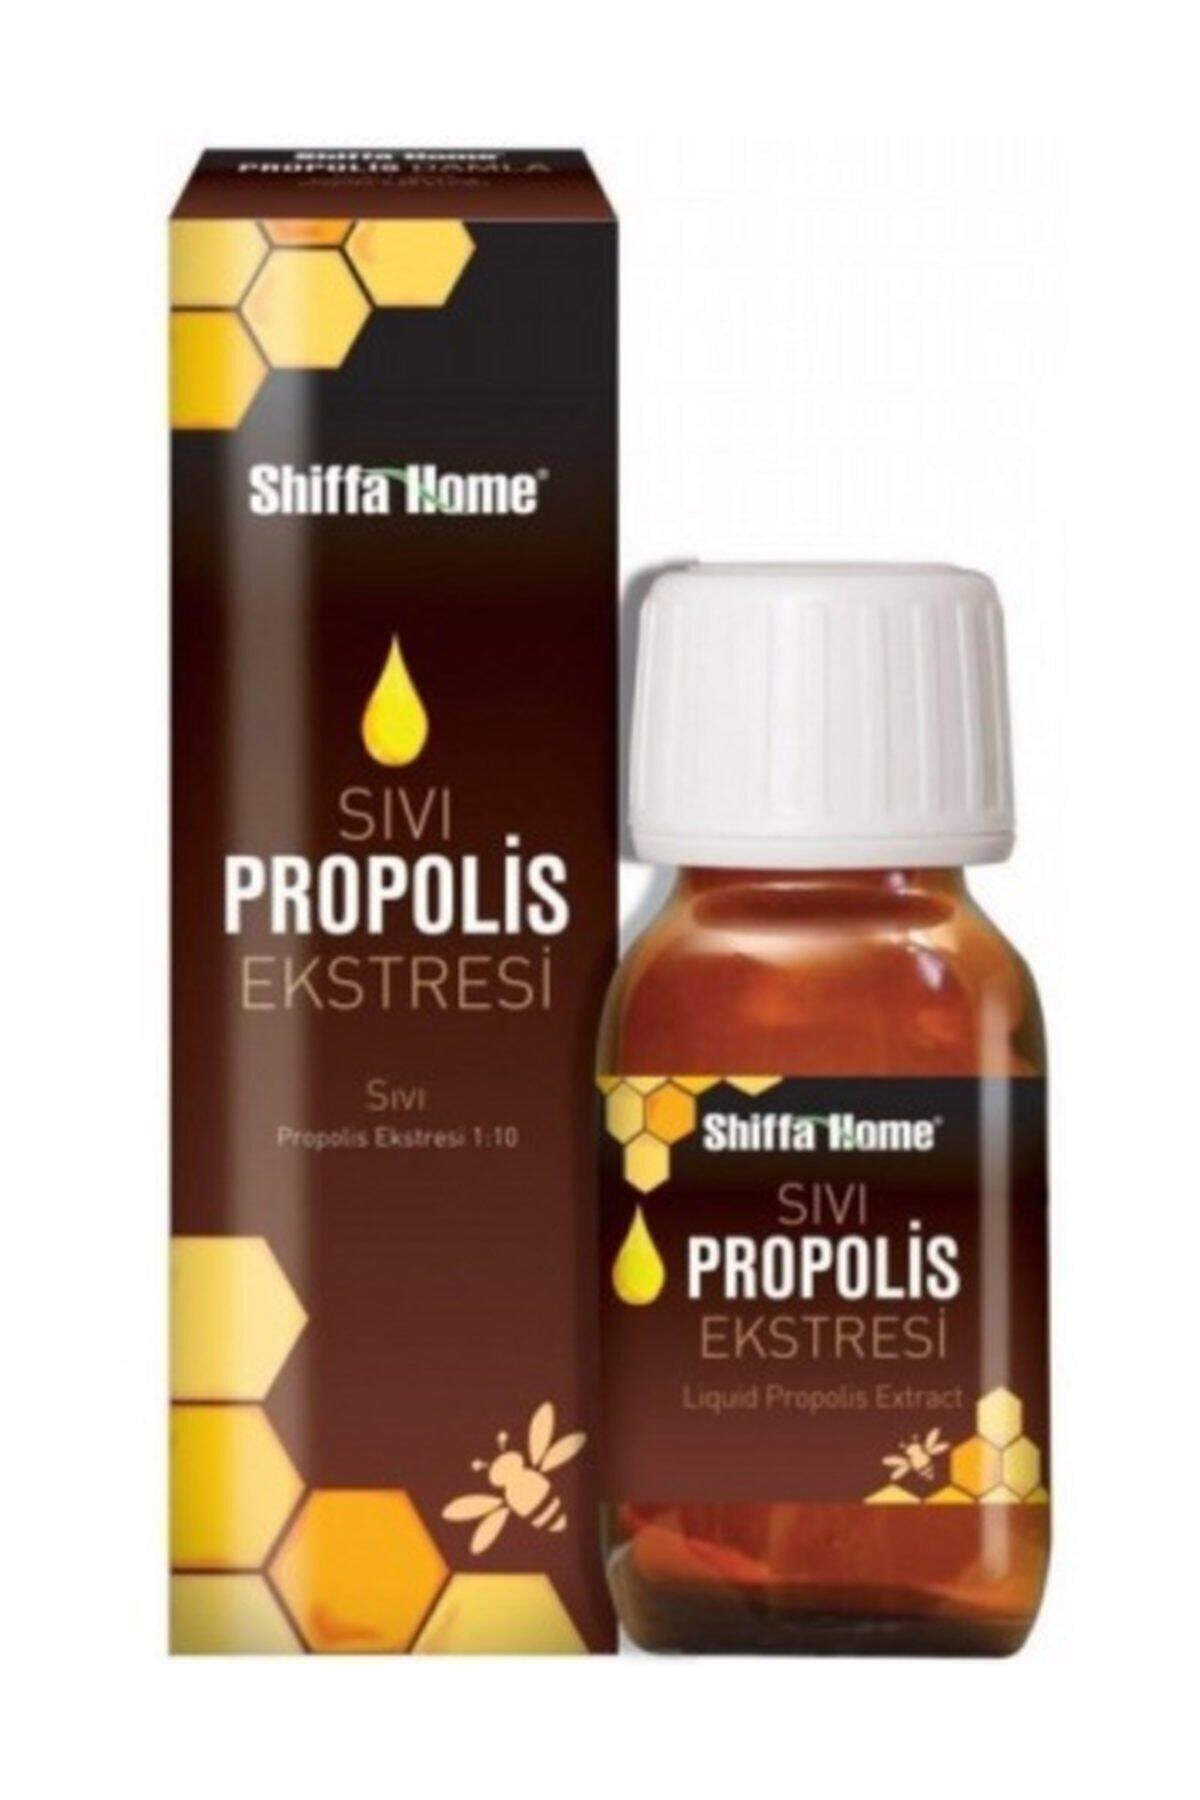 Aksu Vital Shiffa Home Organik Sıvı Propolis Ekstresi 50 Ml %100 Doğal 1